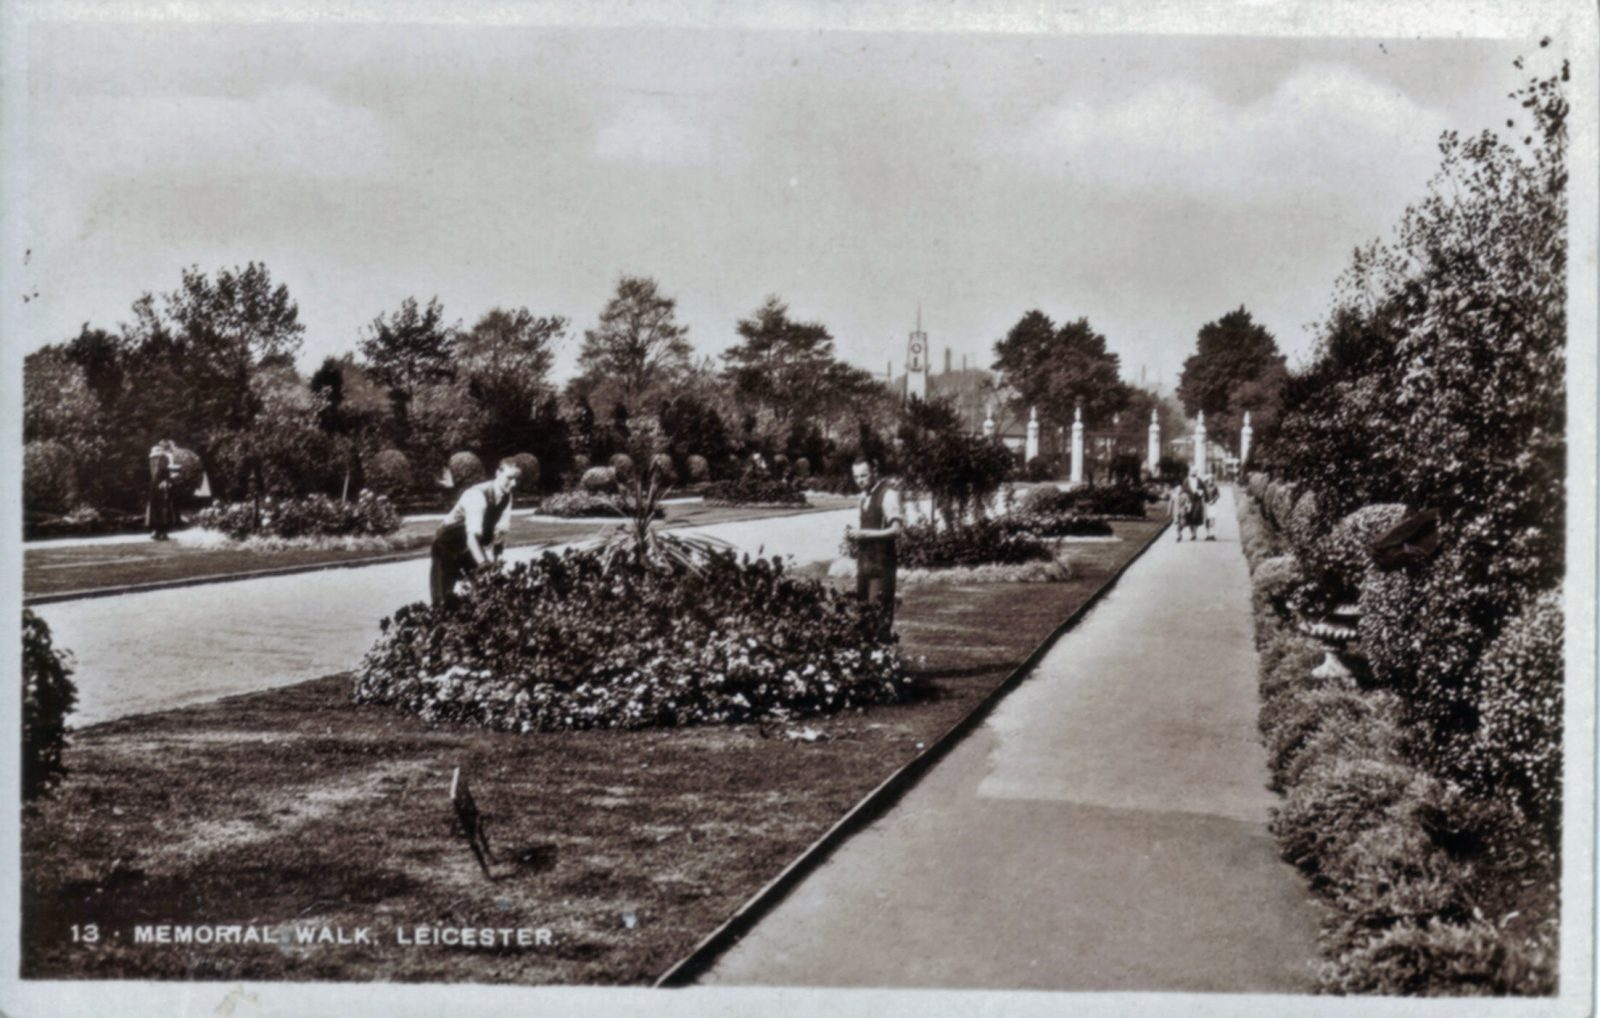 Victoria Park, Leicester. Undated: Memorial walk. (File:1230)